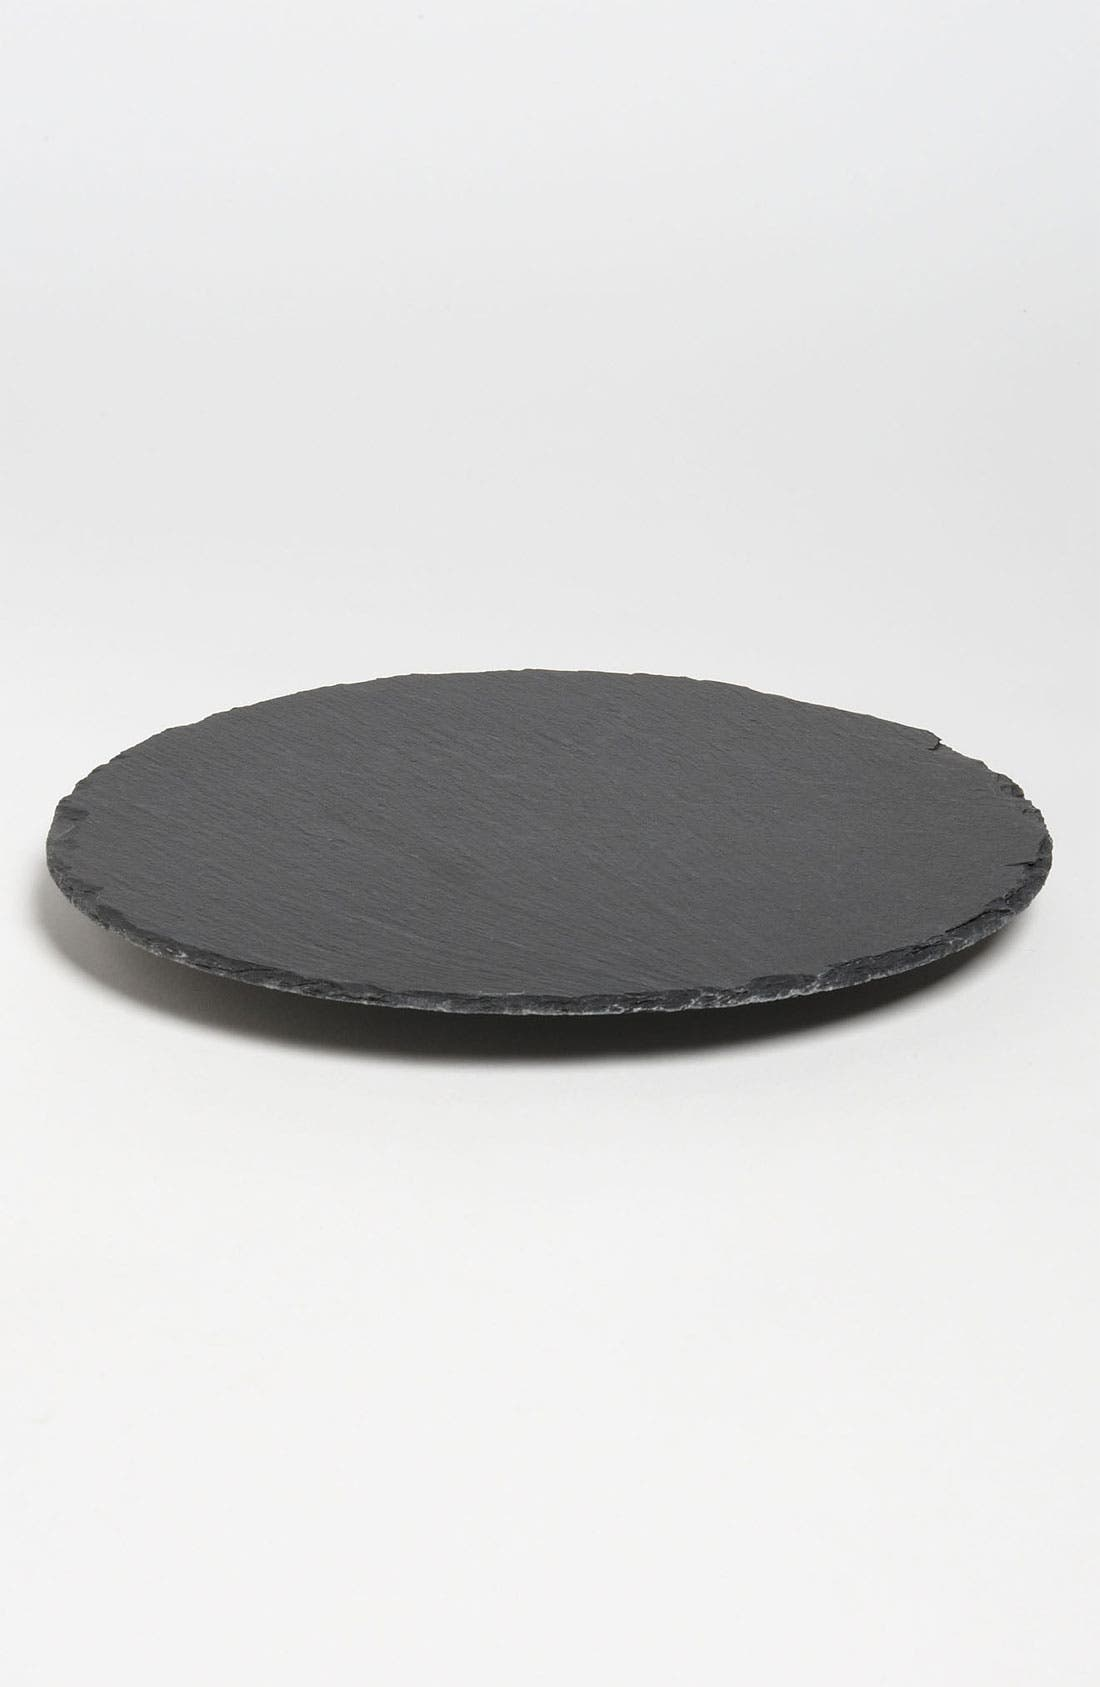 Alternate Image 1 Selected - 'Monaco' Lazy Susan Slate Cheese Board